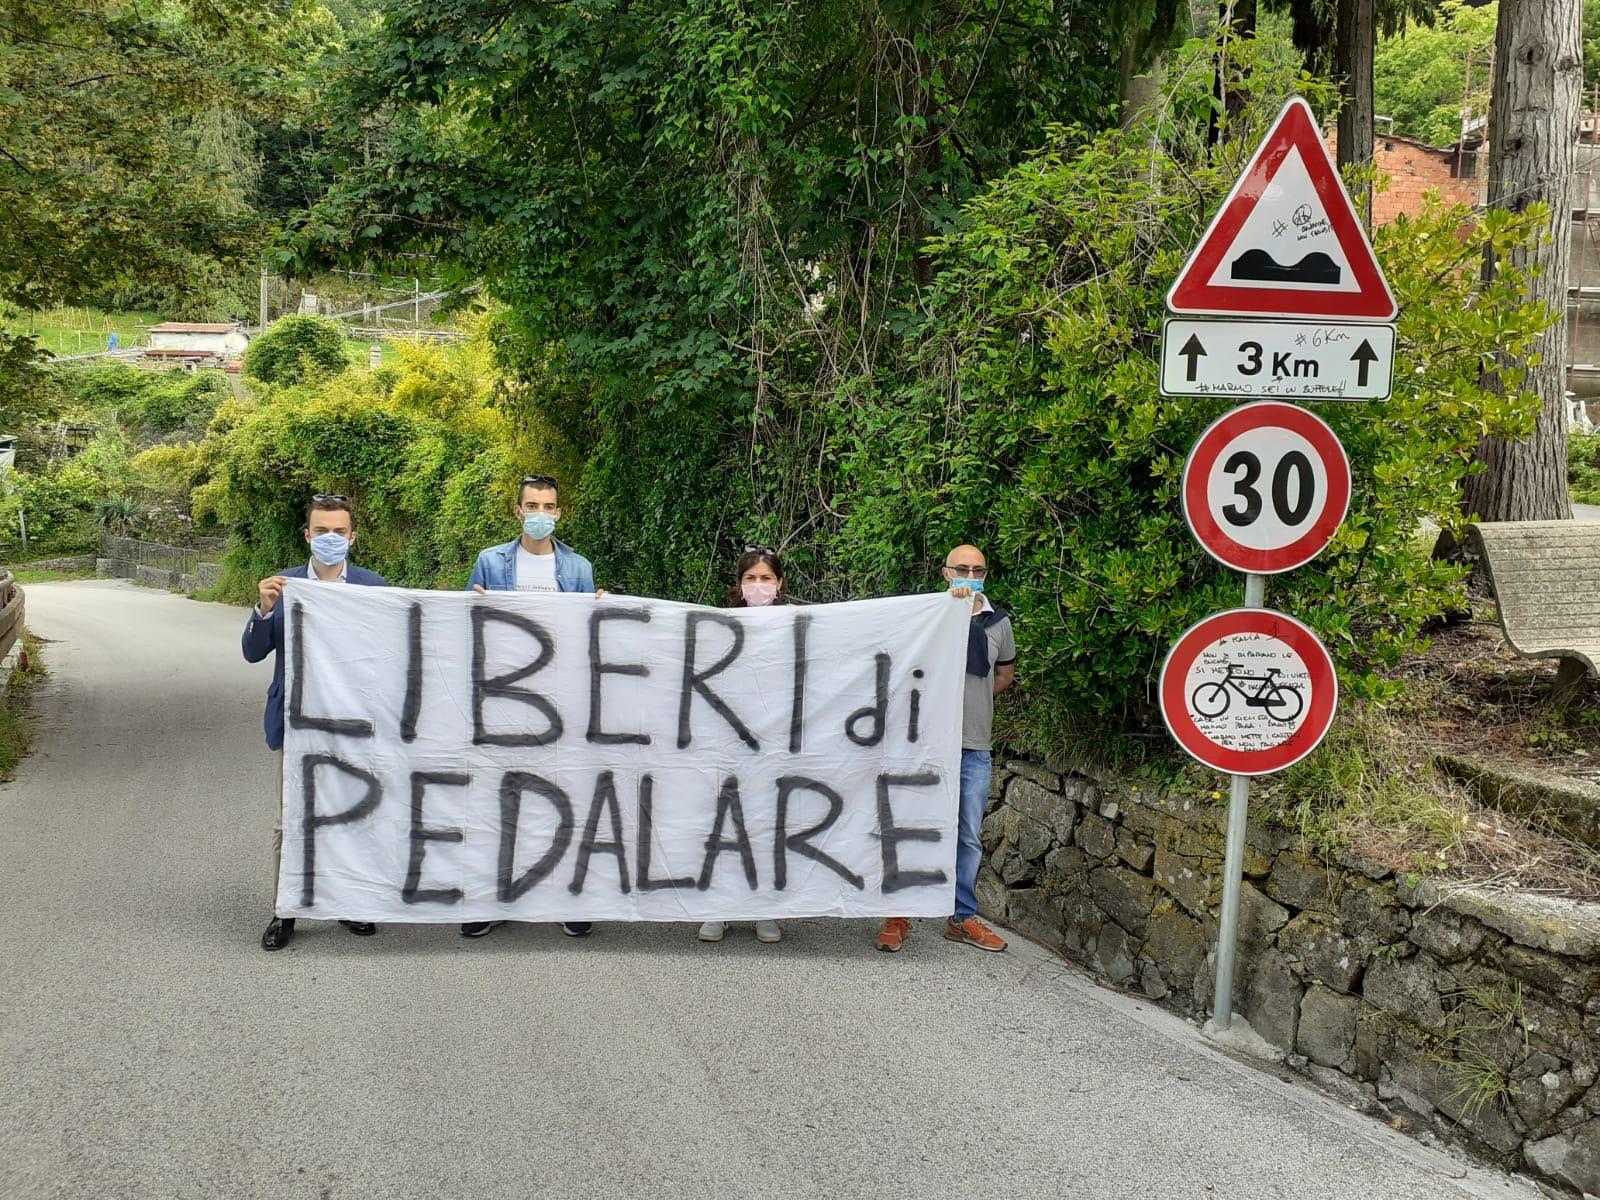 Strade chiuse, protesta a Calamecca